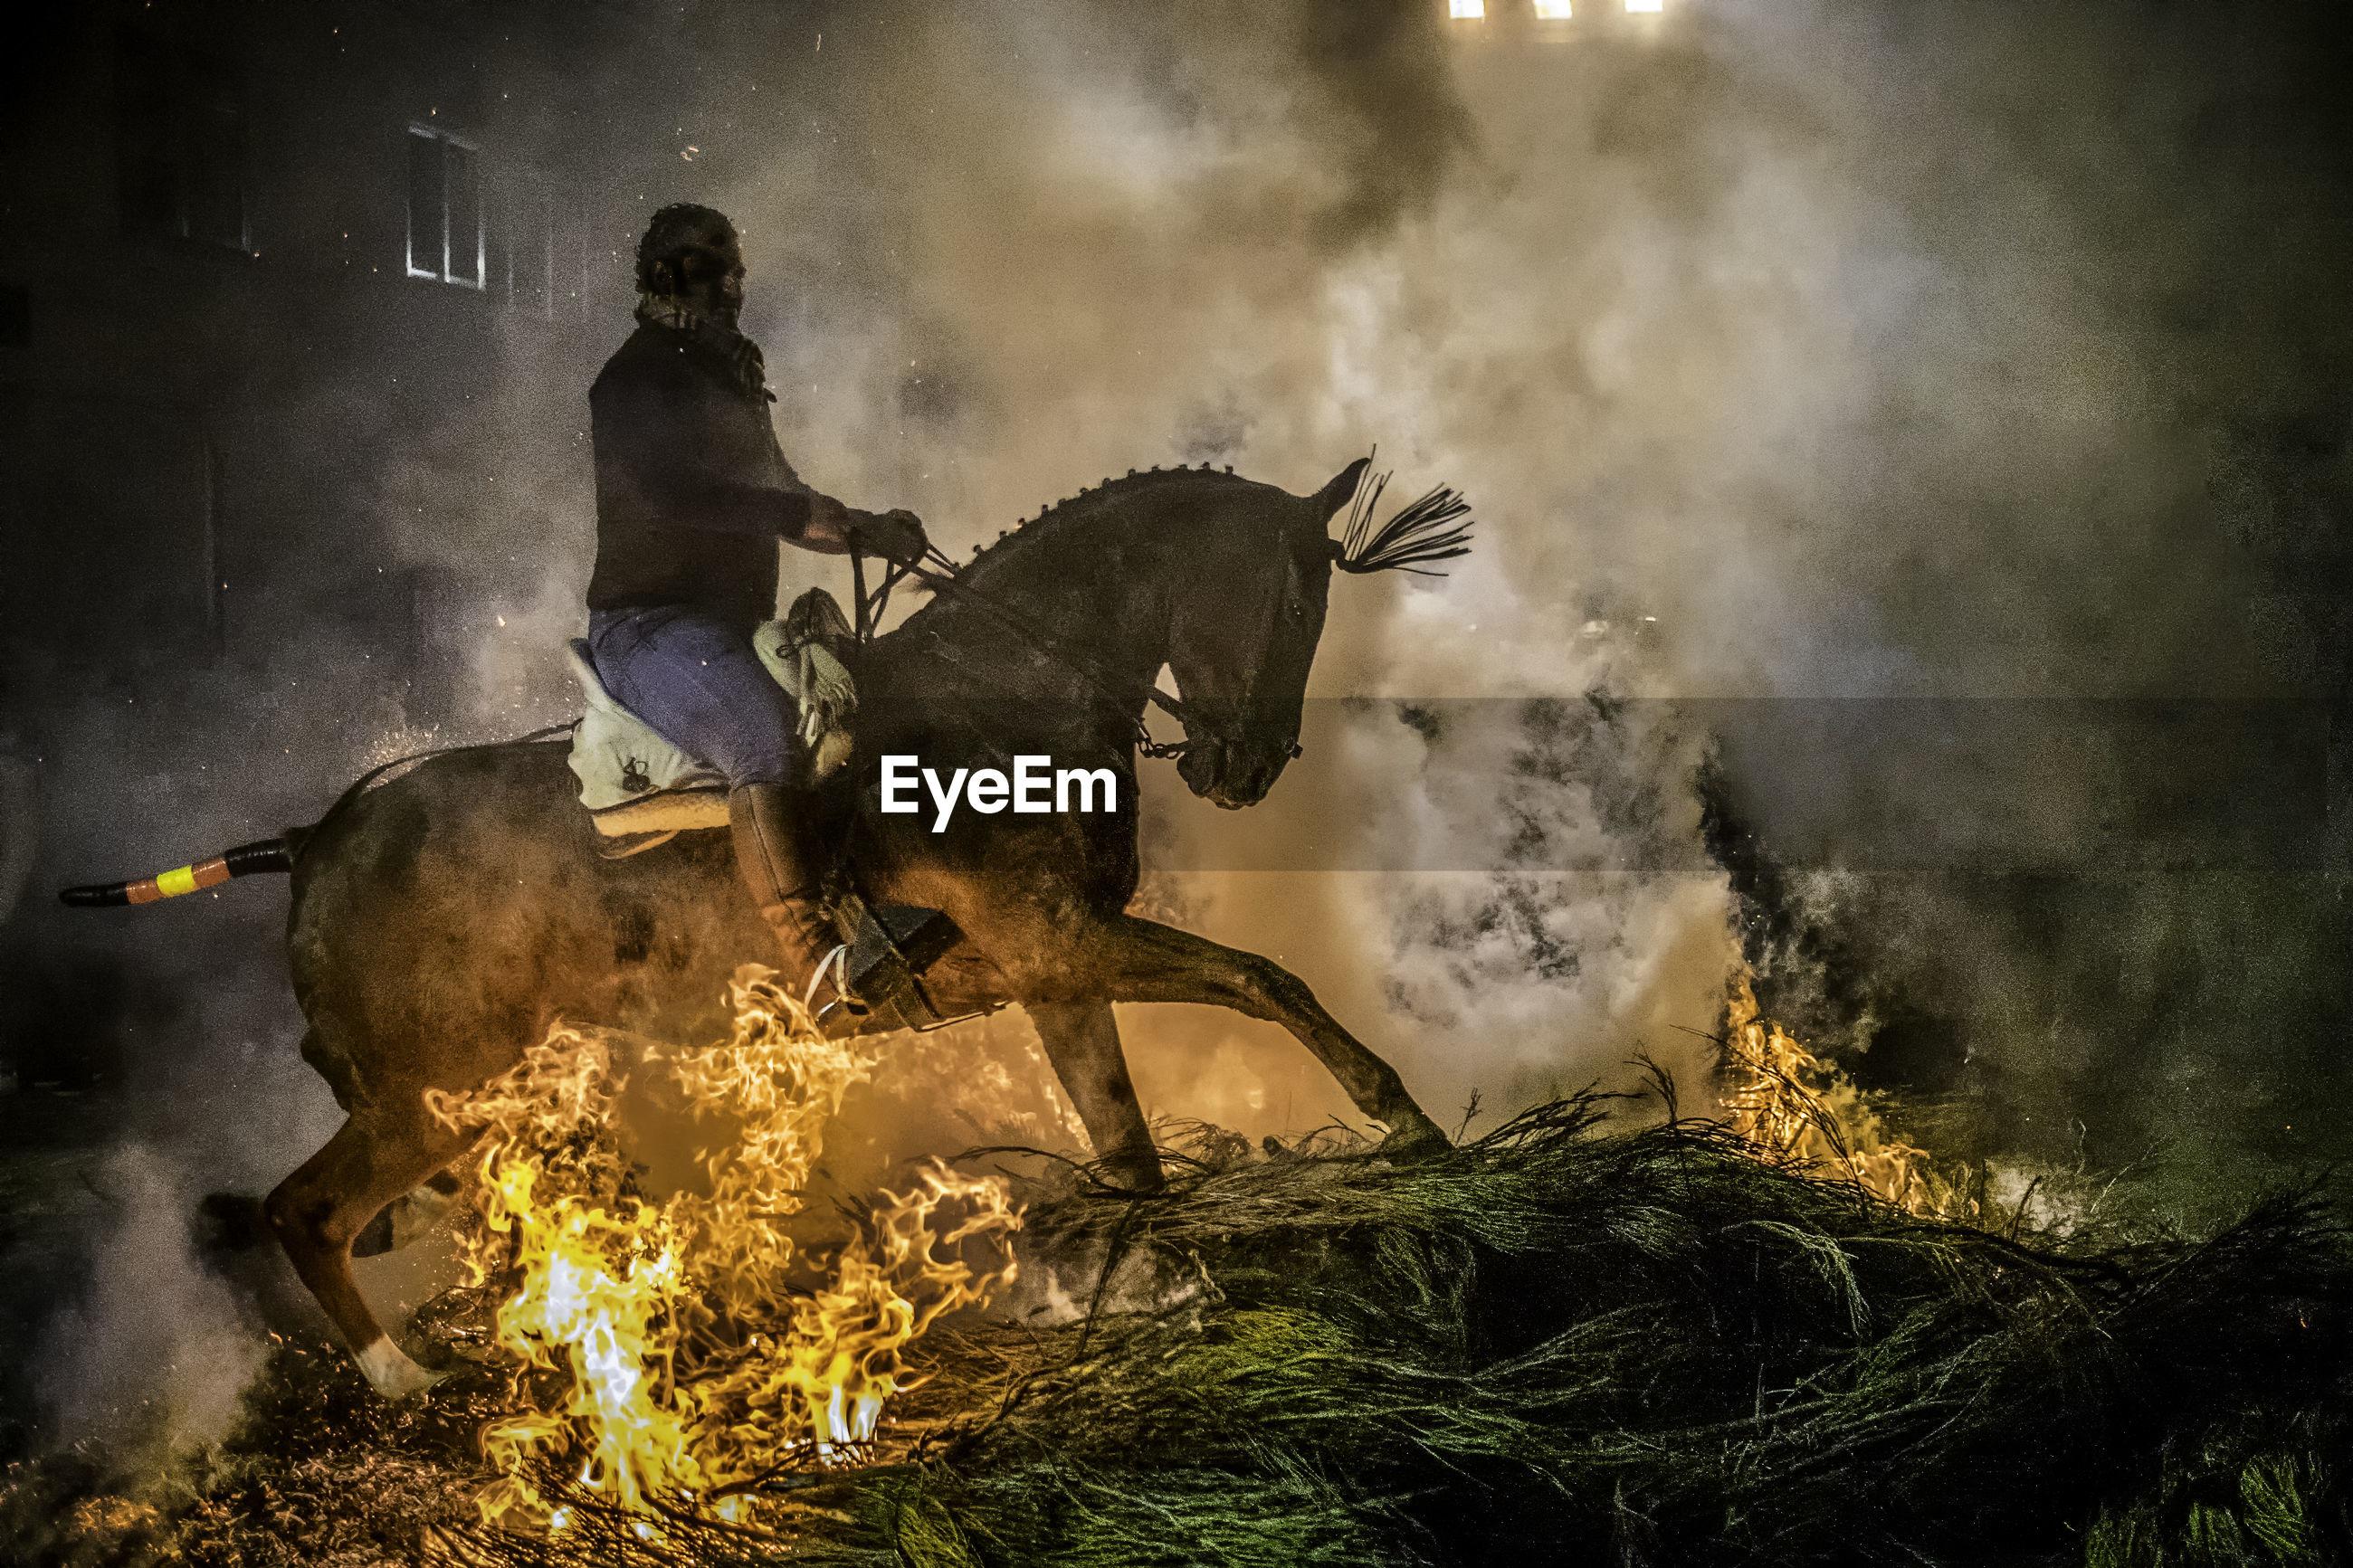 MEN STANDING AGAINST FIRE ON NIGHT